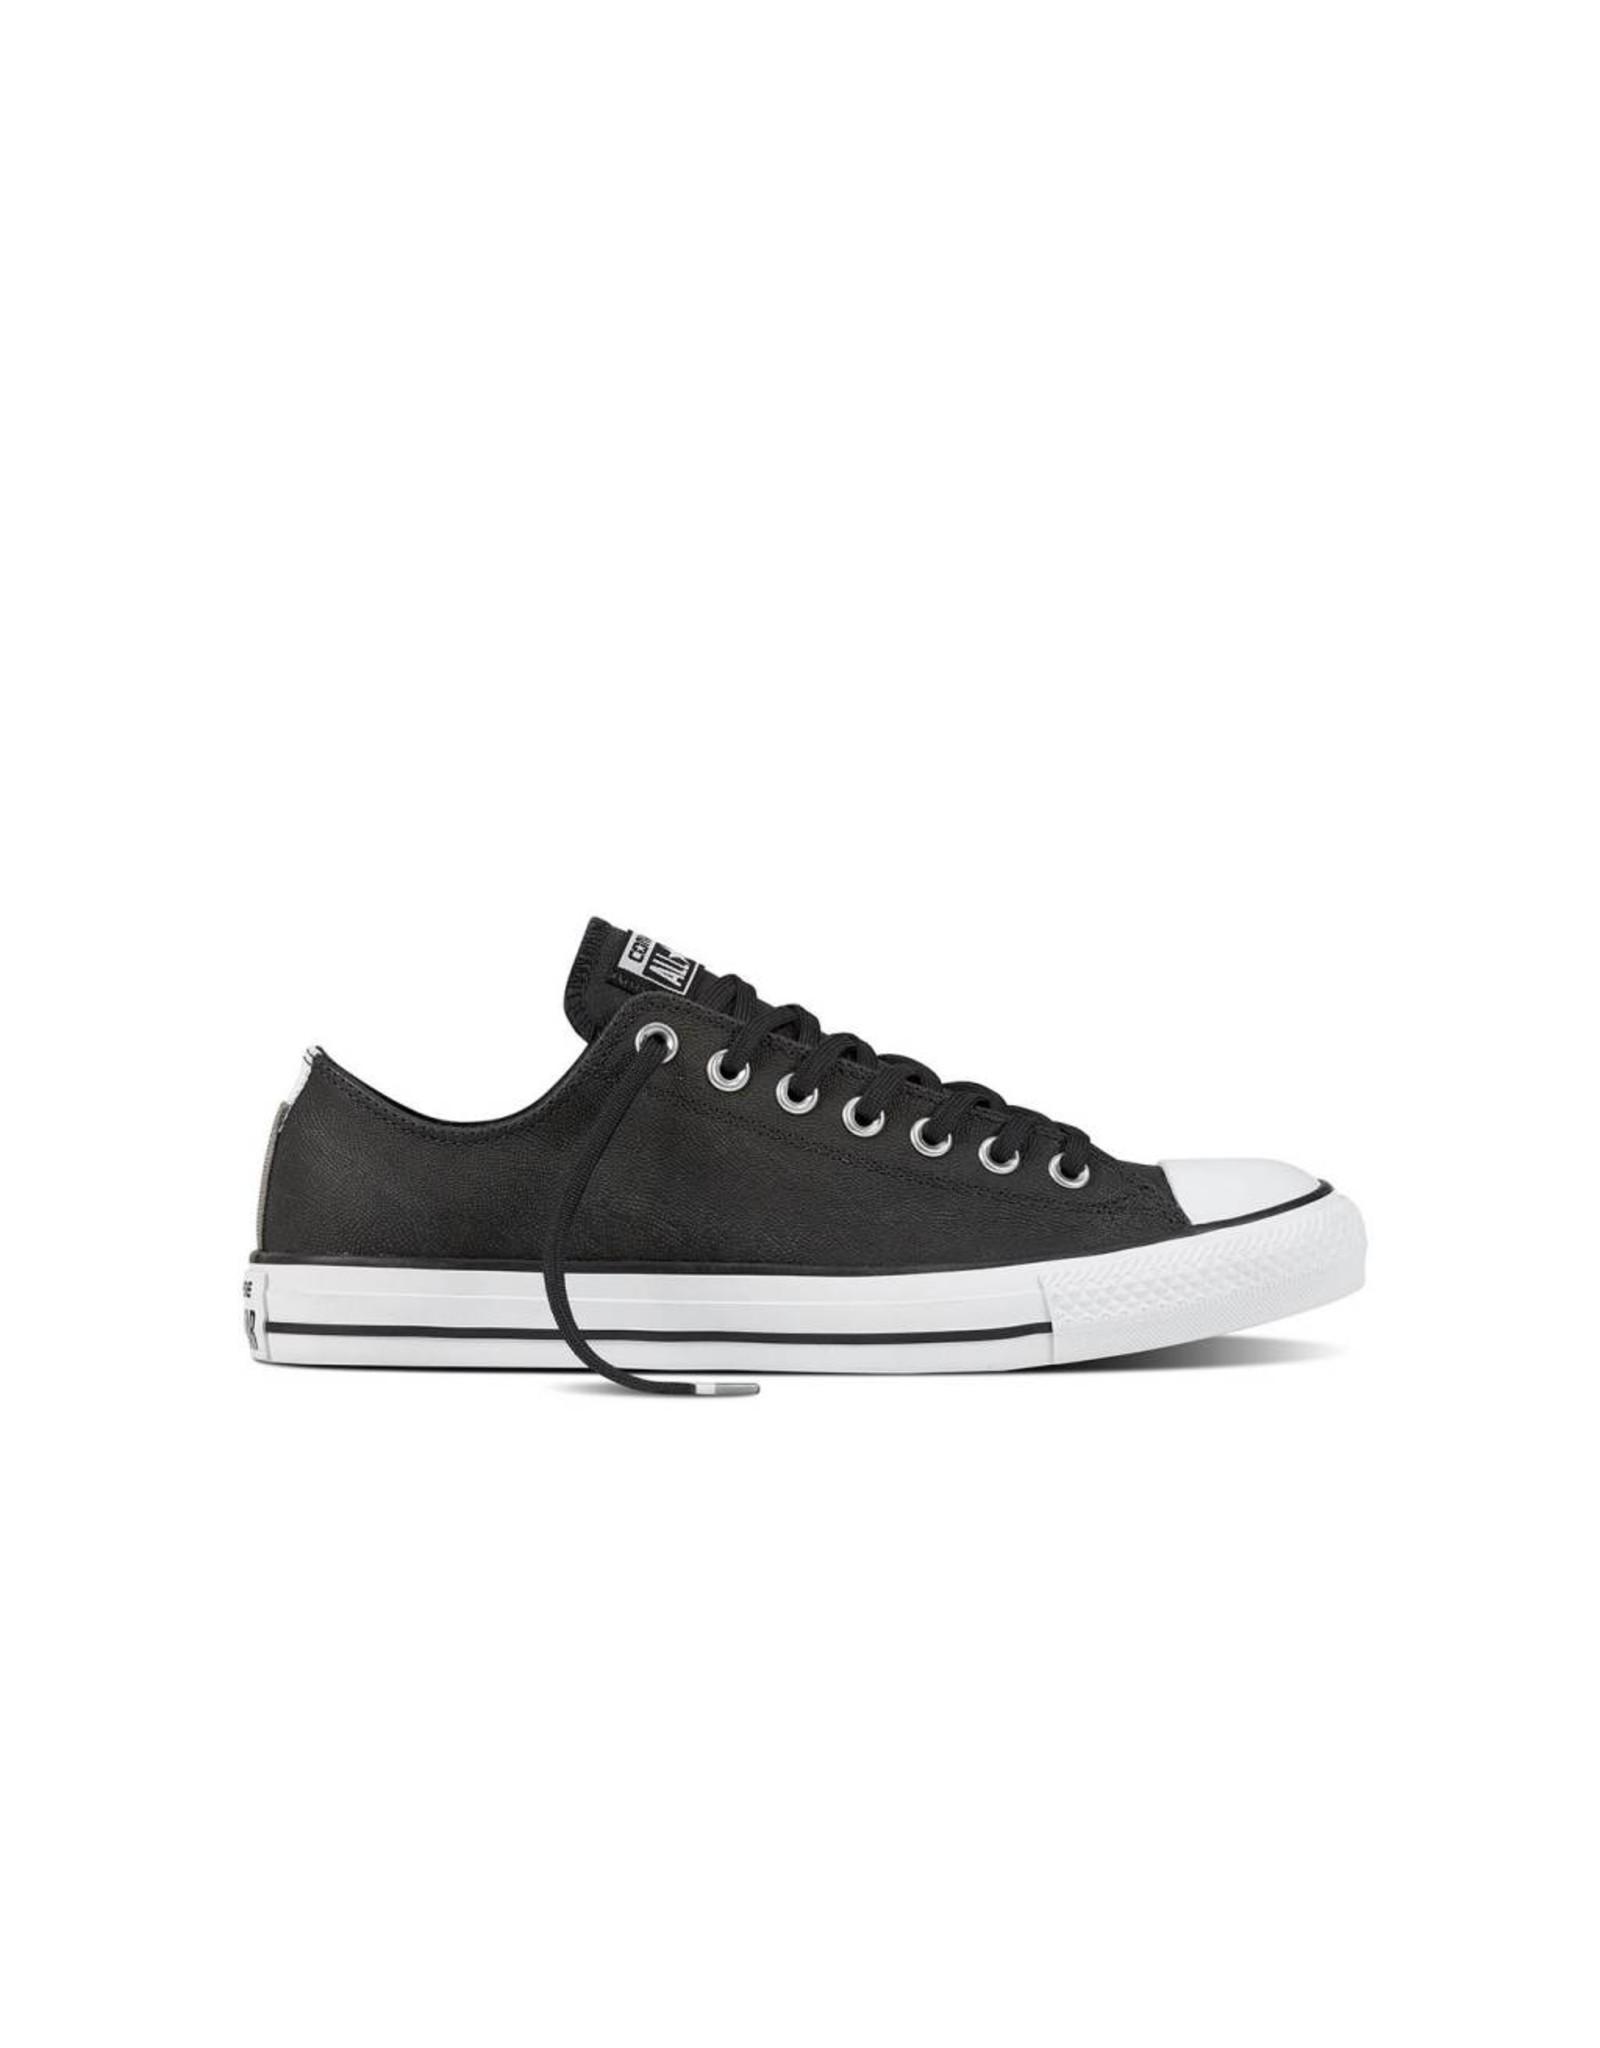 CONVERSE CHUCK TAYLOR OX LEATHER BLACK/BLACK/WHITE CC12BLA-159614C